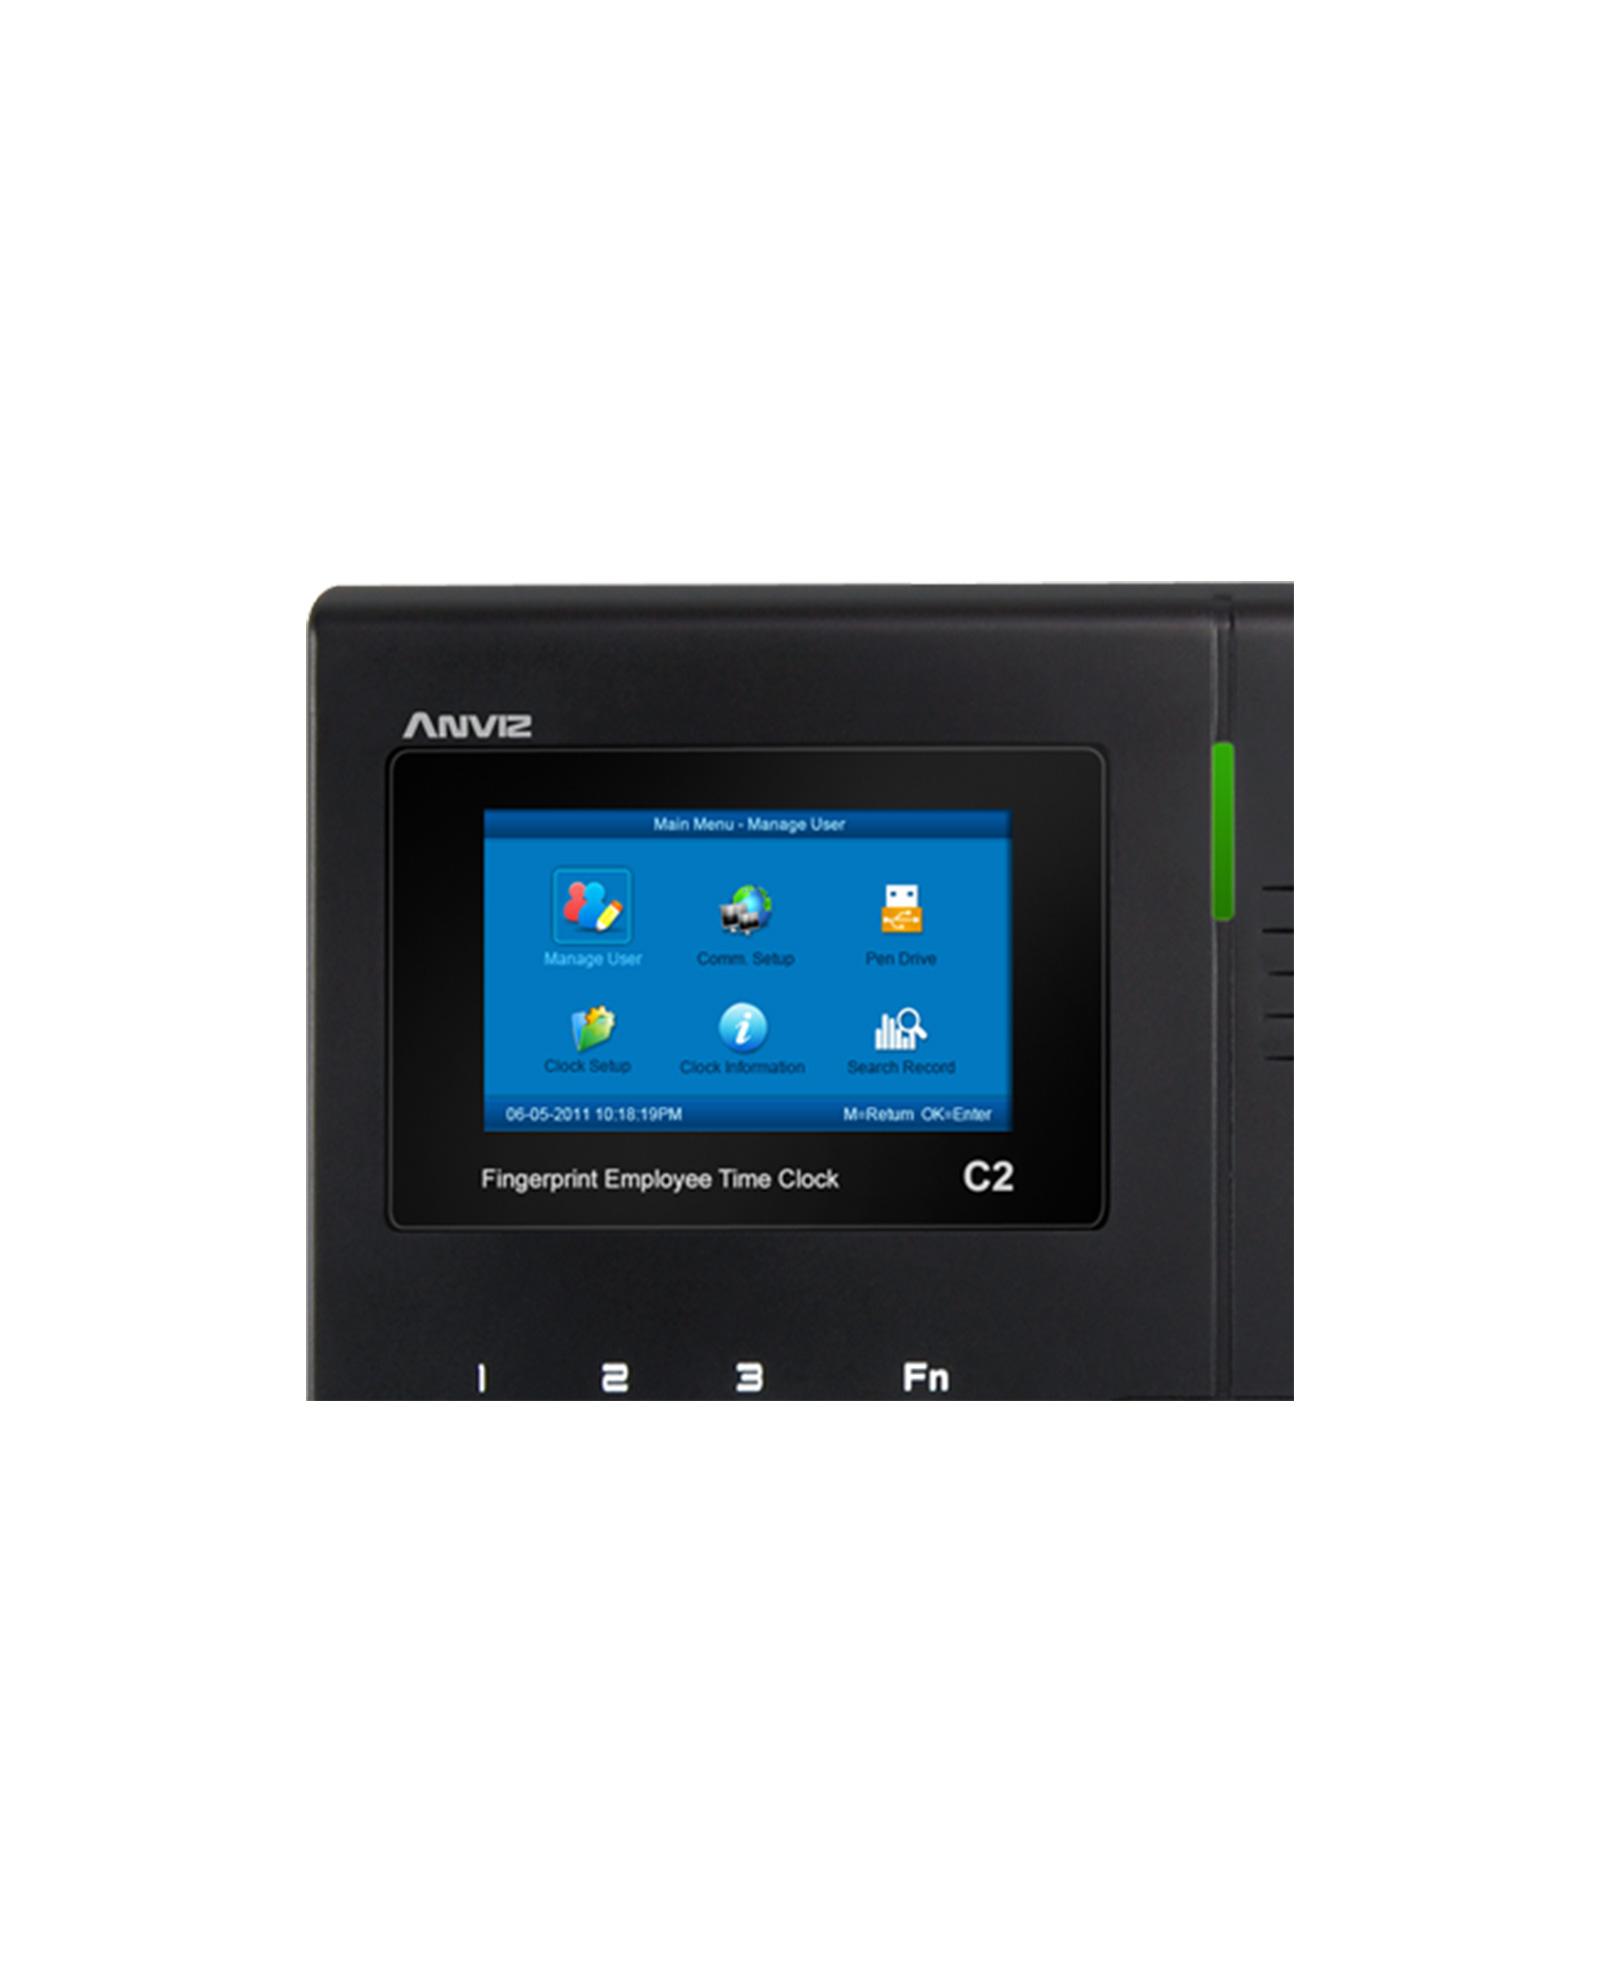 accesscontrol_professionalalarm3